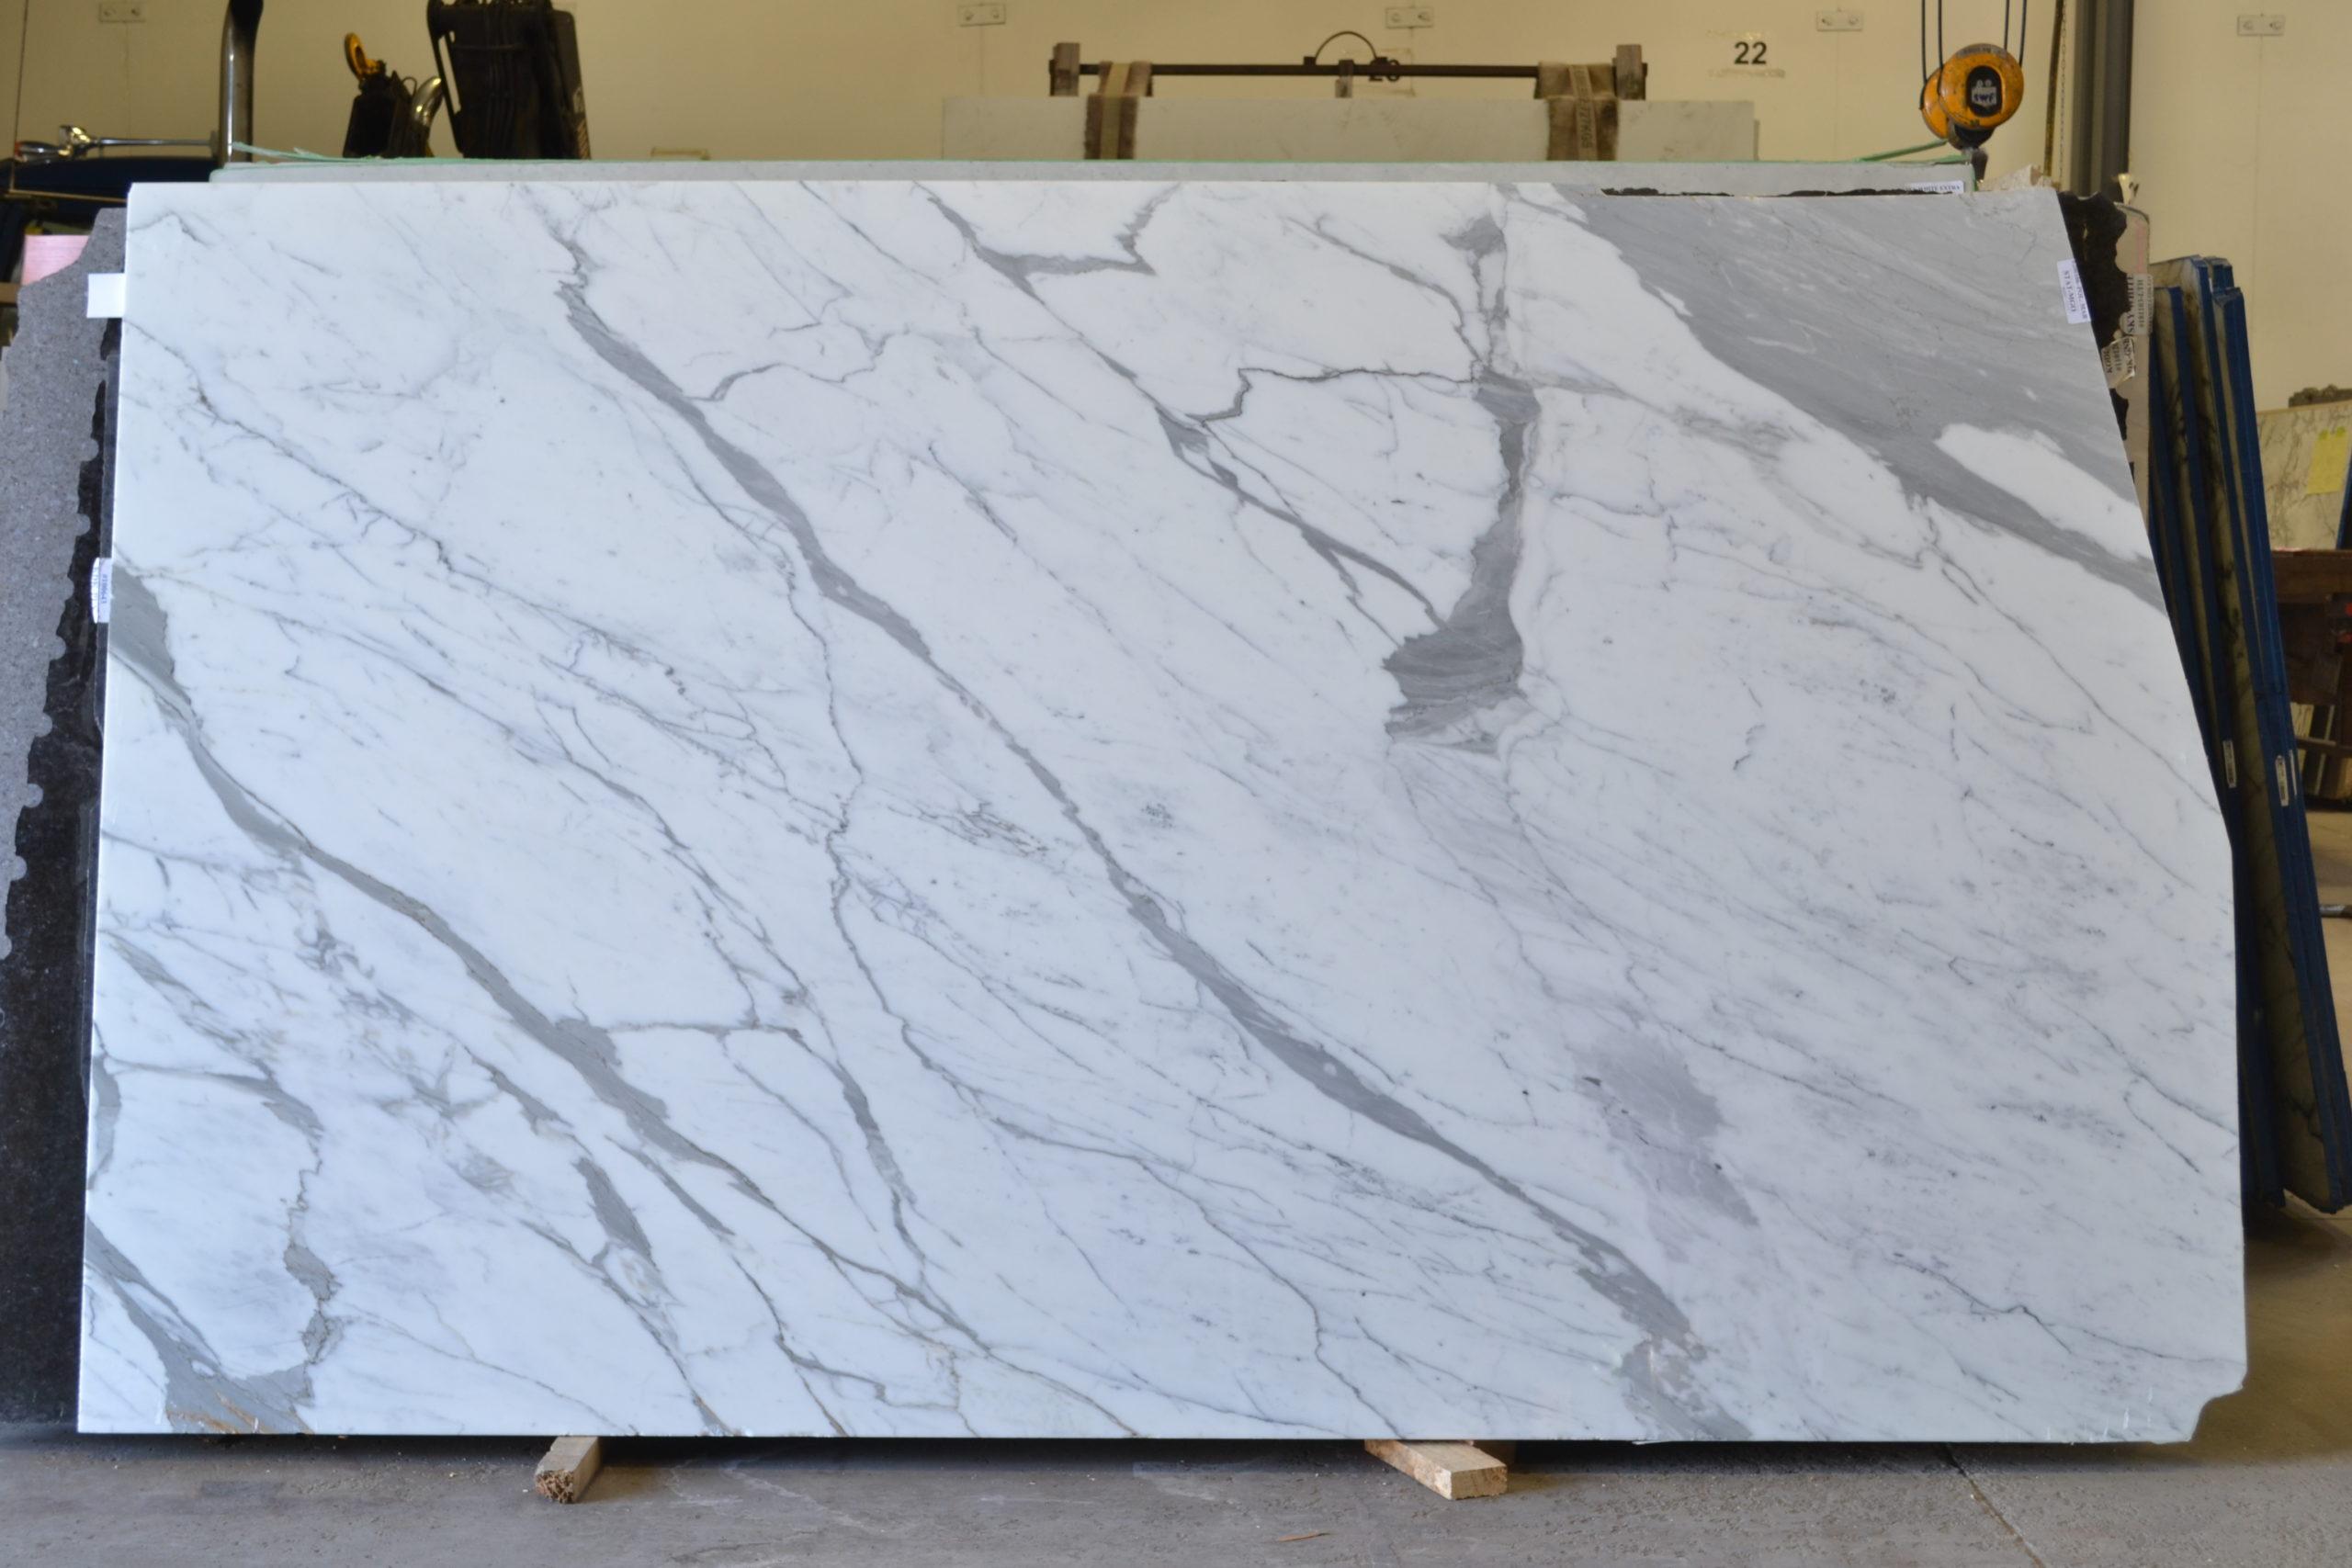 Statuario 2cm Polished Marble #200106-Pol Mar (MGO)